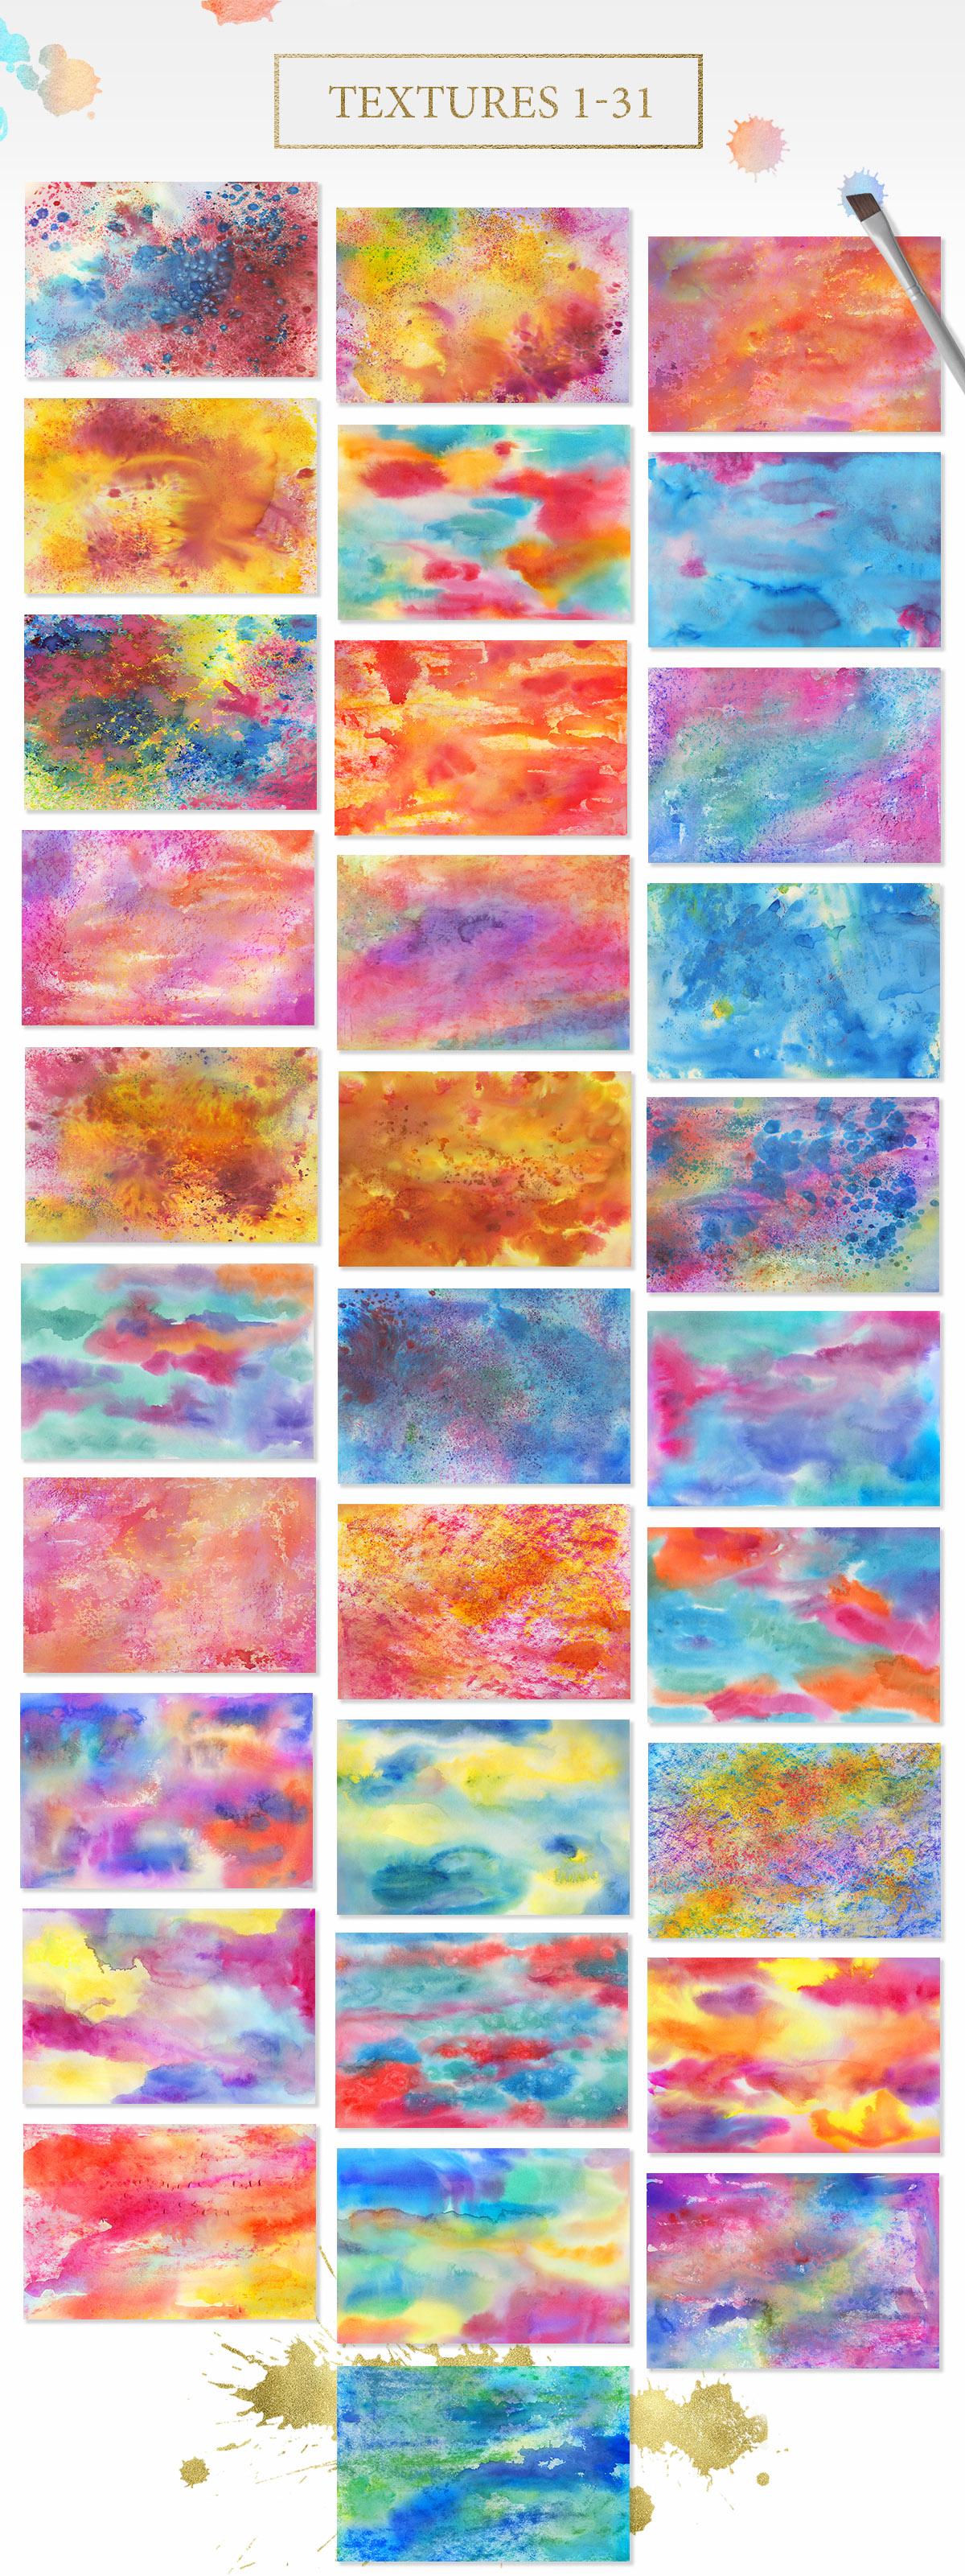 62 Diversity Textures example image 4